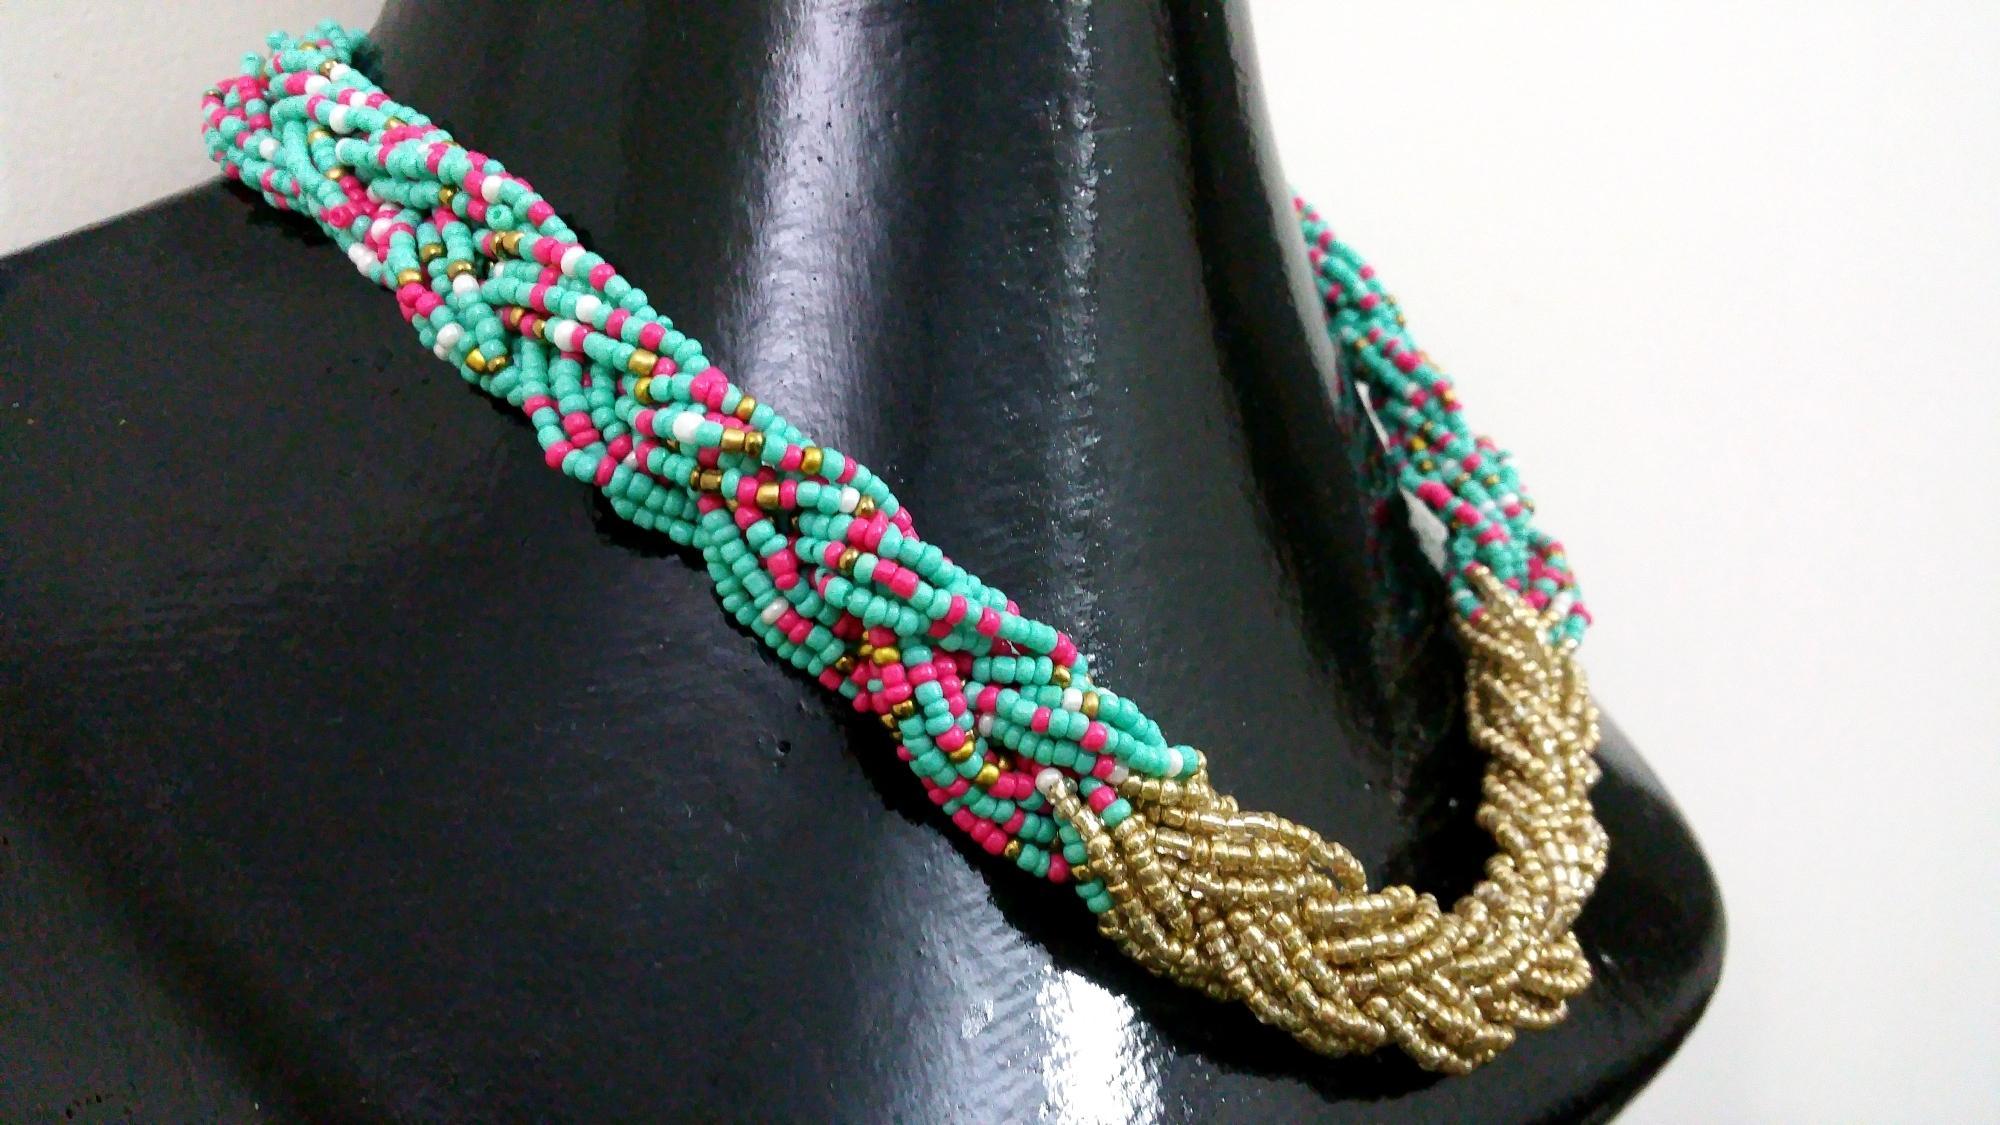 NéonKrallık Pastel Party Braided Bead Necklace (Multi Coloured)